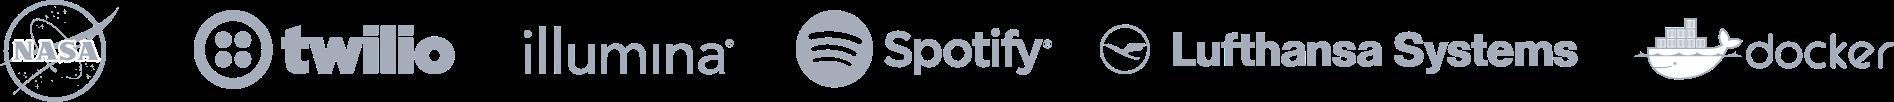 aperçu-client-ruban-logos